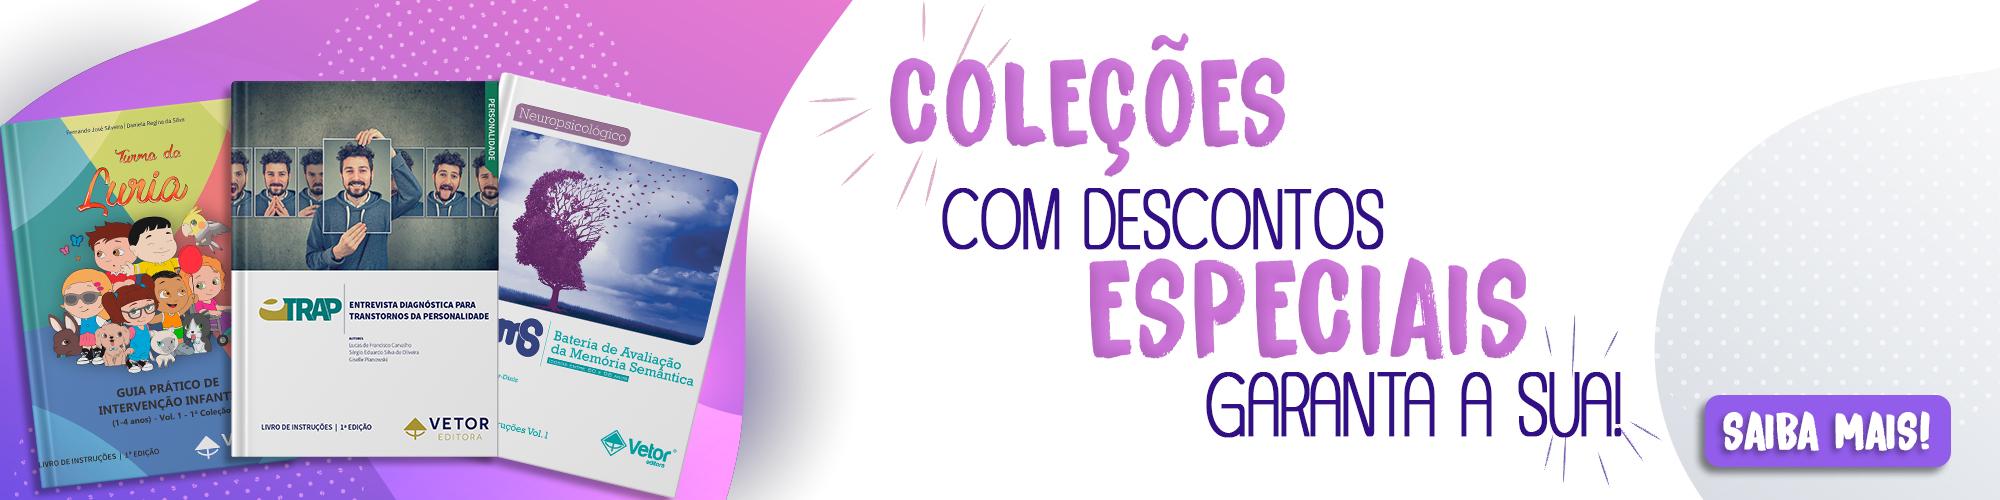 PromocaoColecoes